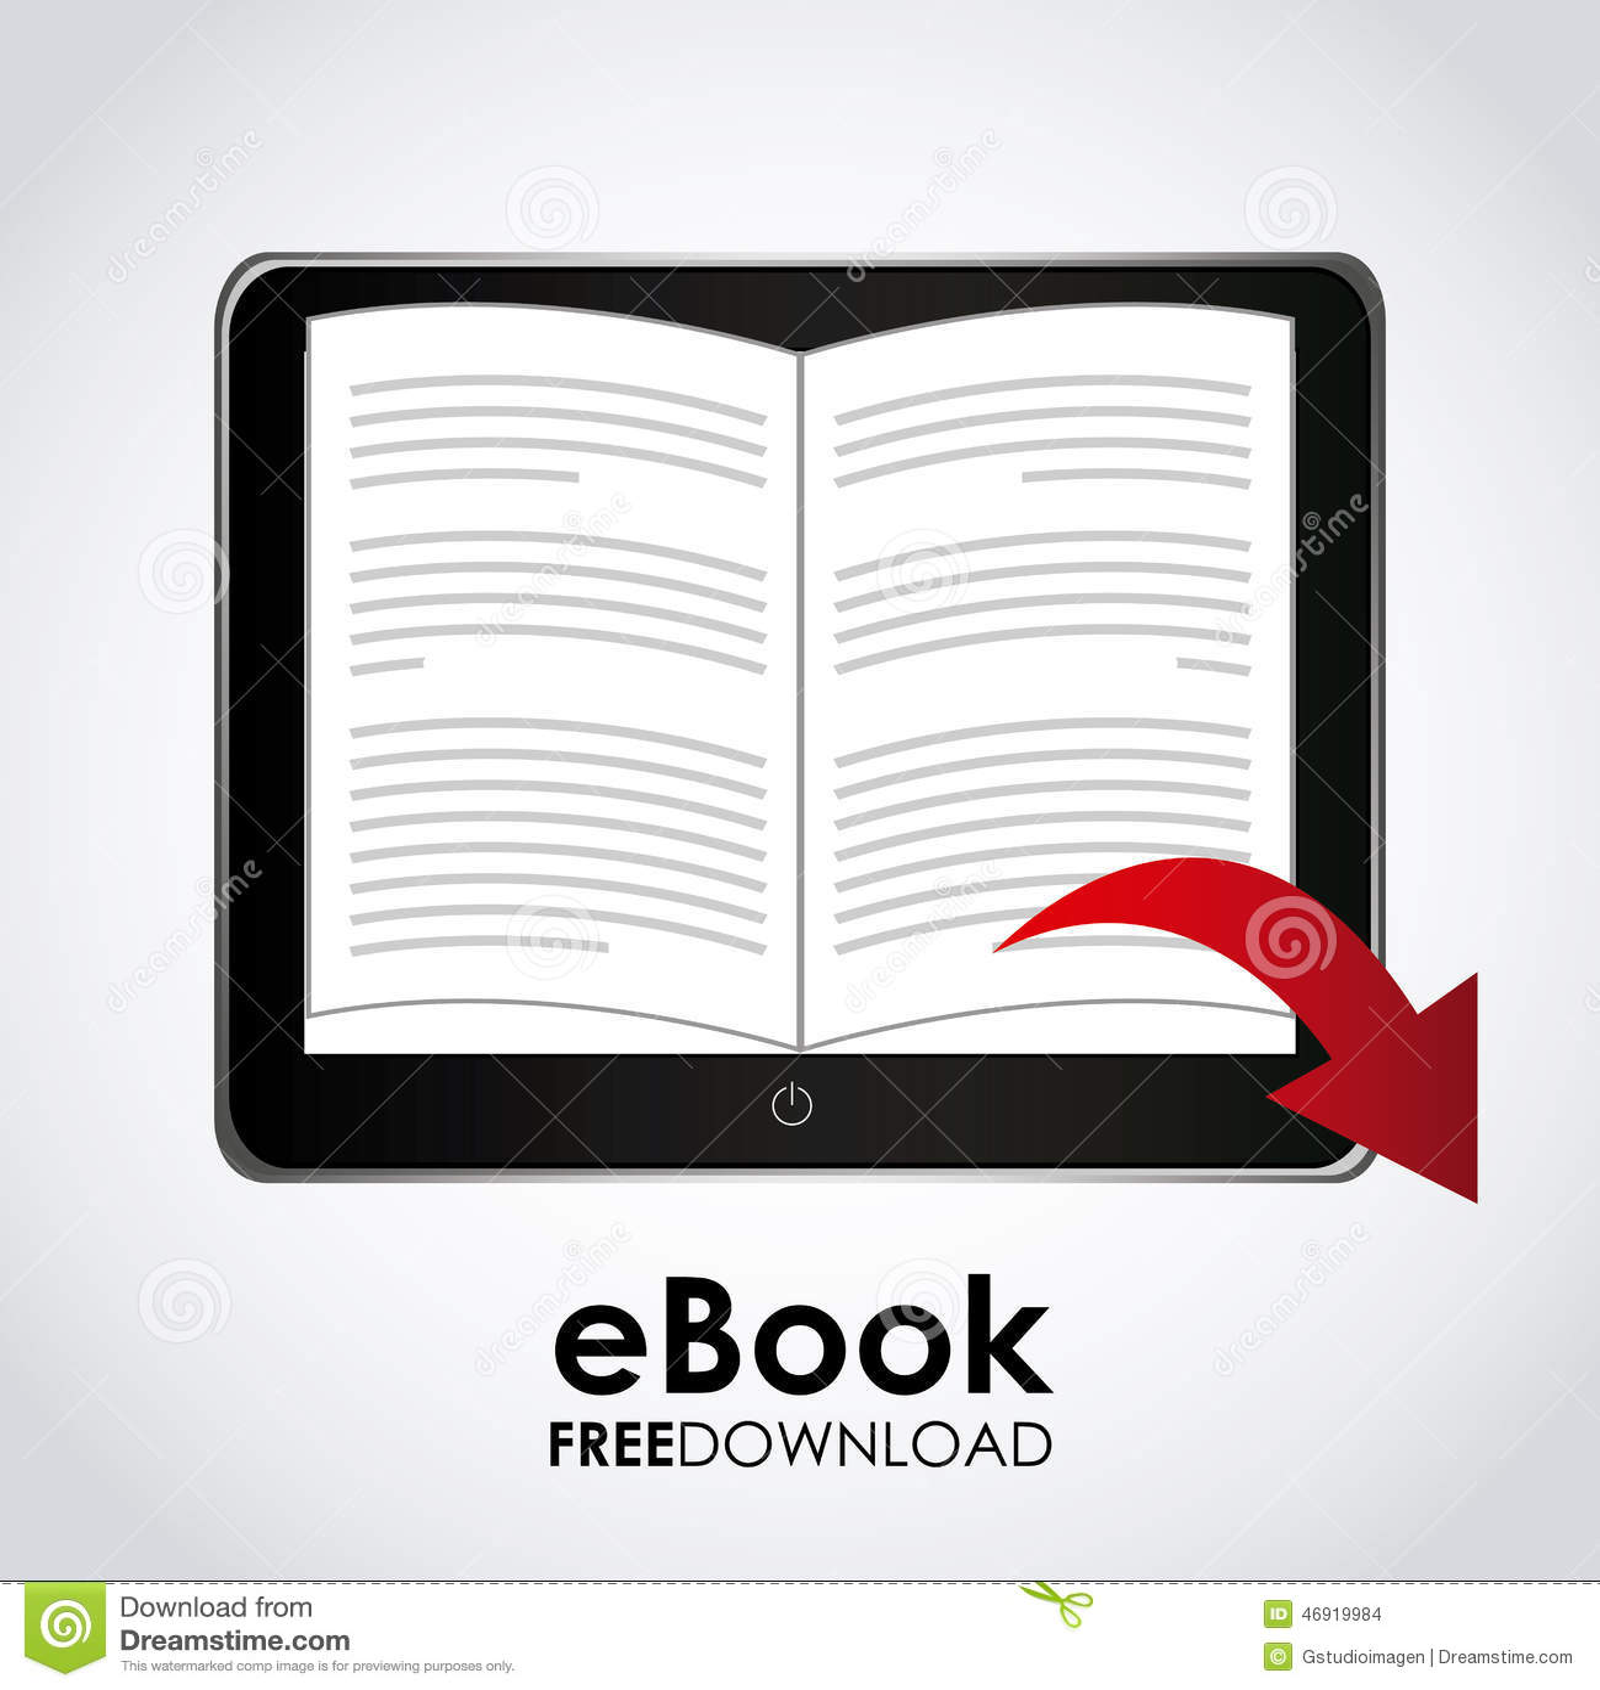 Modern School Ebook Design